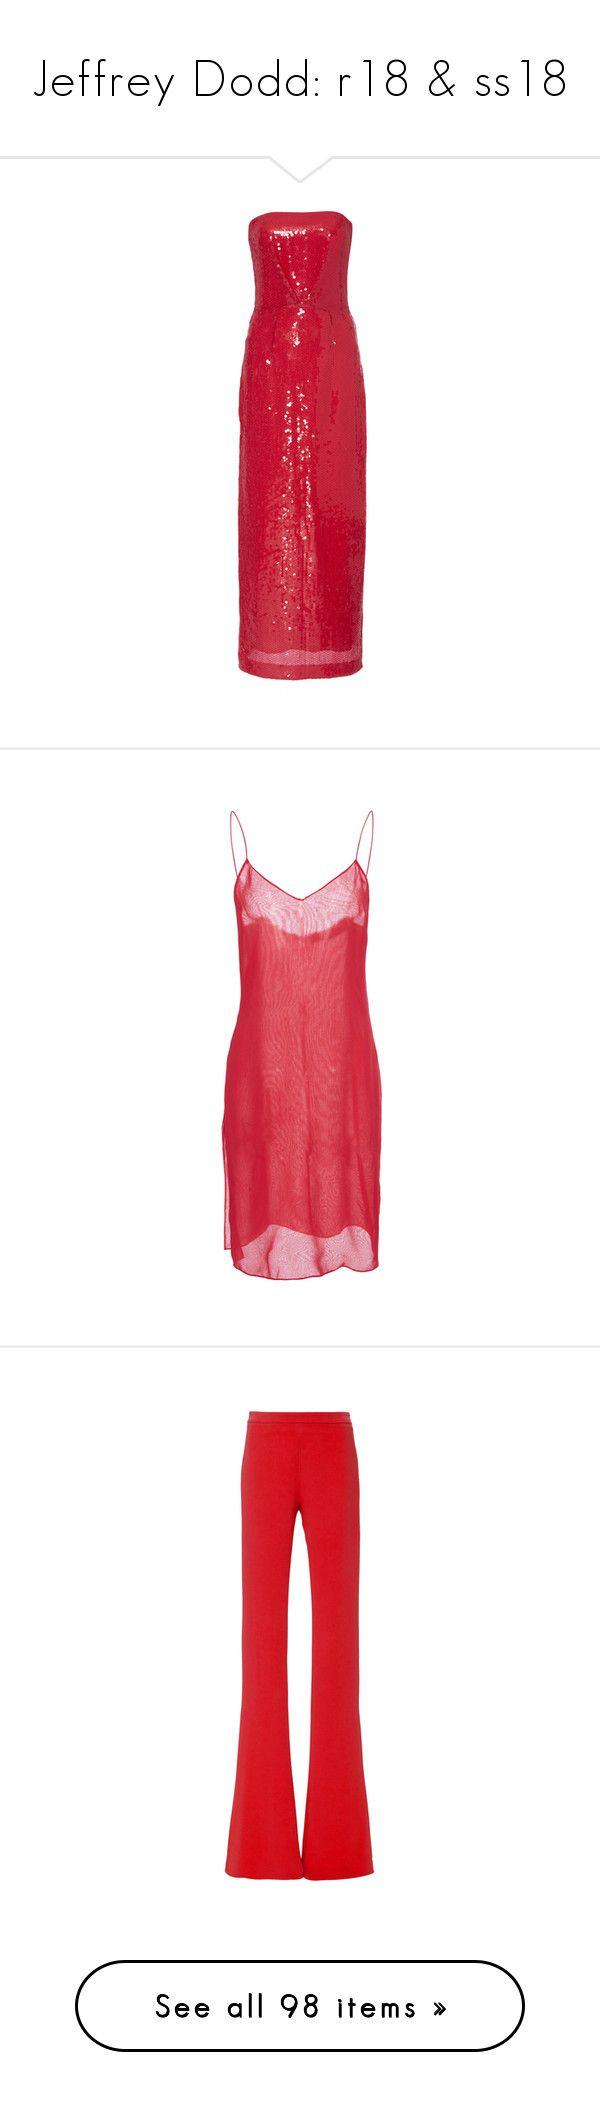 """Jeffrey Dodd: r18 & ss18"" by livnd ❤ liked on Polyvore featuring livndfashion, resort2018, livndjeffreydodd, JeffreyDodd, dresses, gowns, red, strapless gown, strapless bustier and bustier dress"